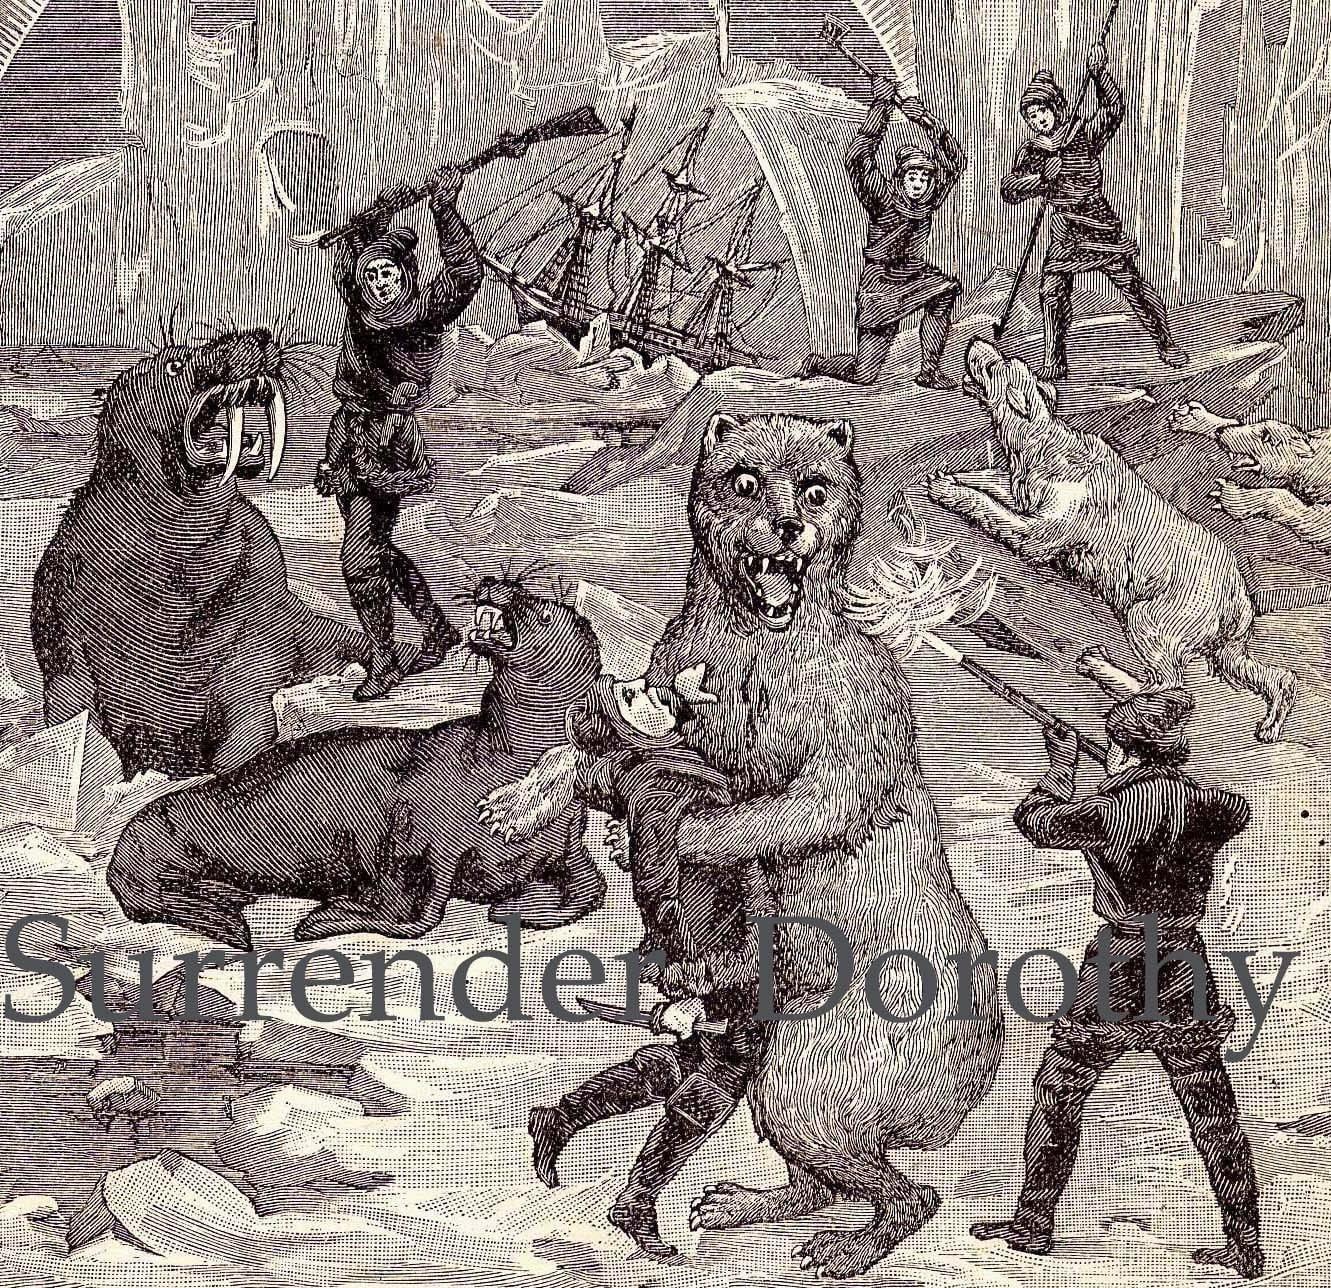 Polar bears walrus explorers weird vintage victorian print of for Odd victorian names